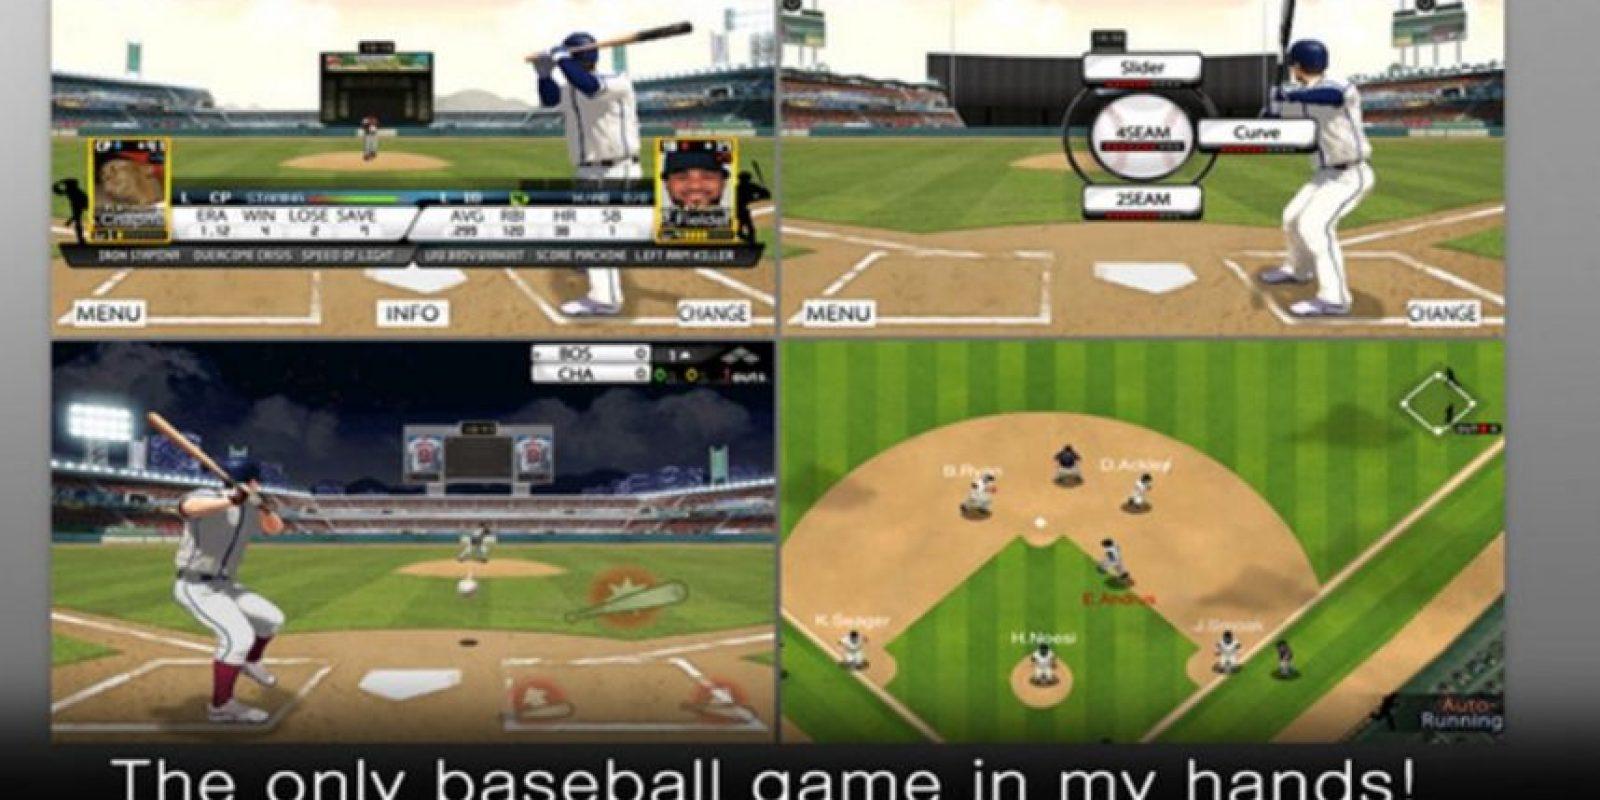 9 Innings: 2015 Pro Baseball Foto:Com2uS USA, Inc.